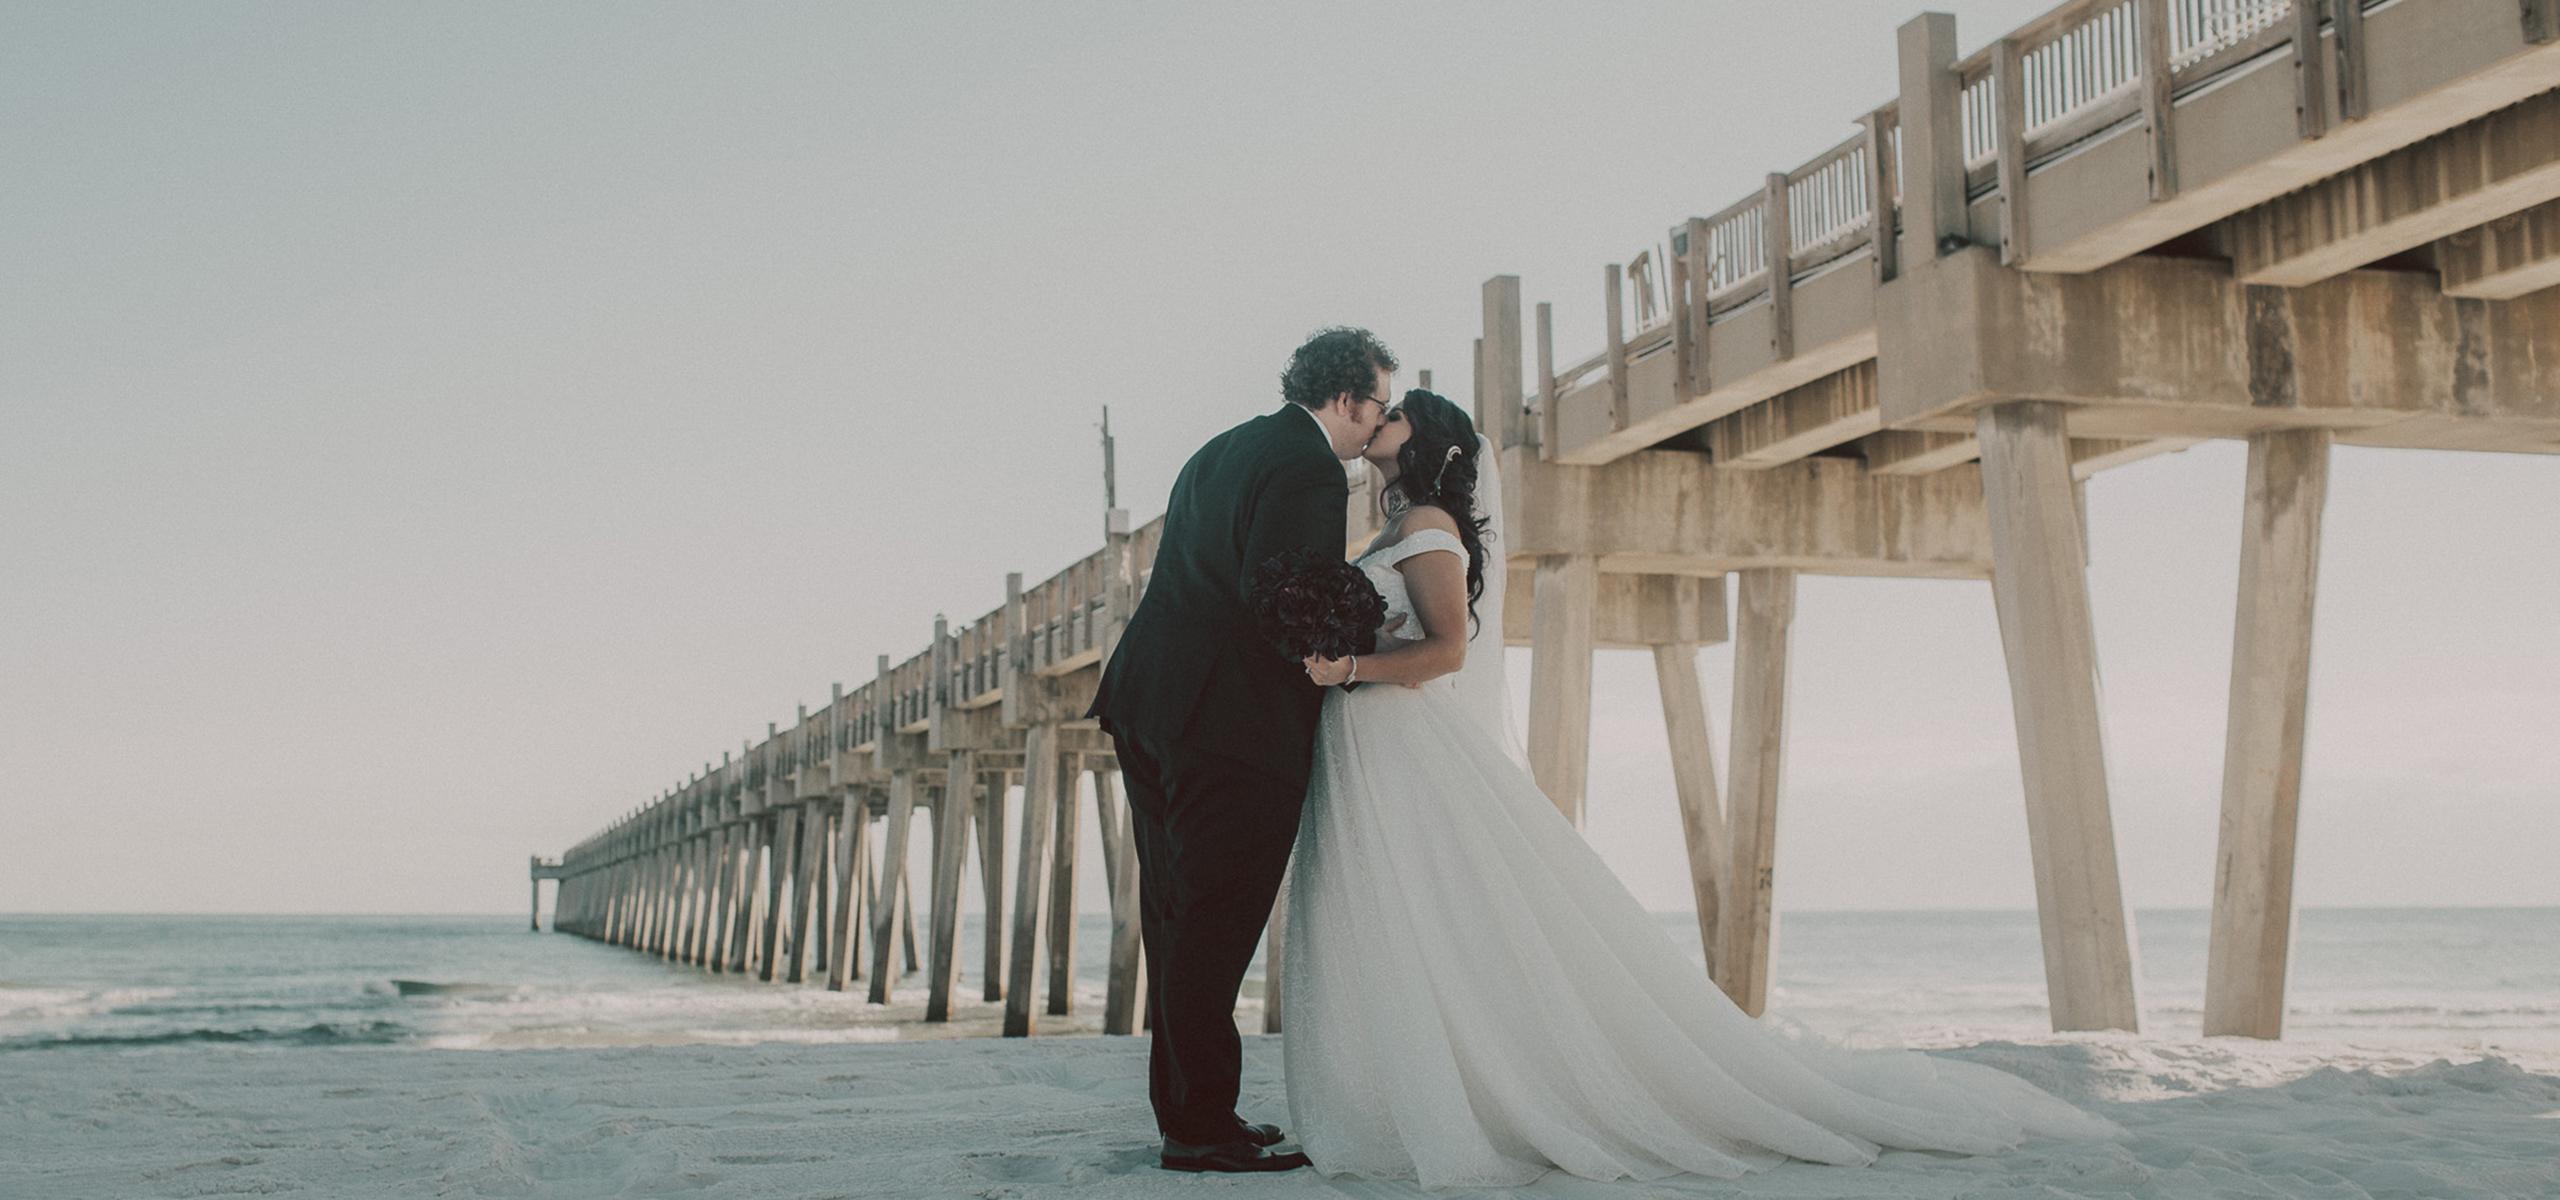 Delray Beach Florida Wedding Photography + Elopement Photography